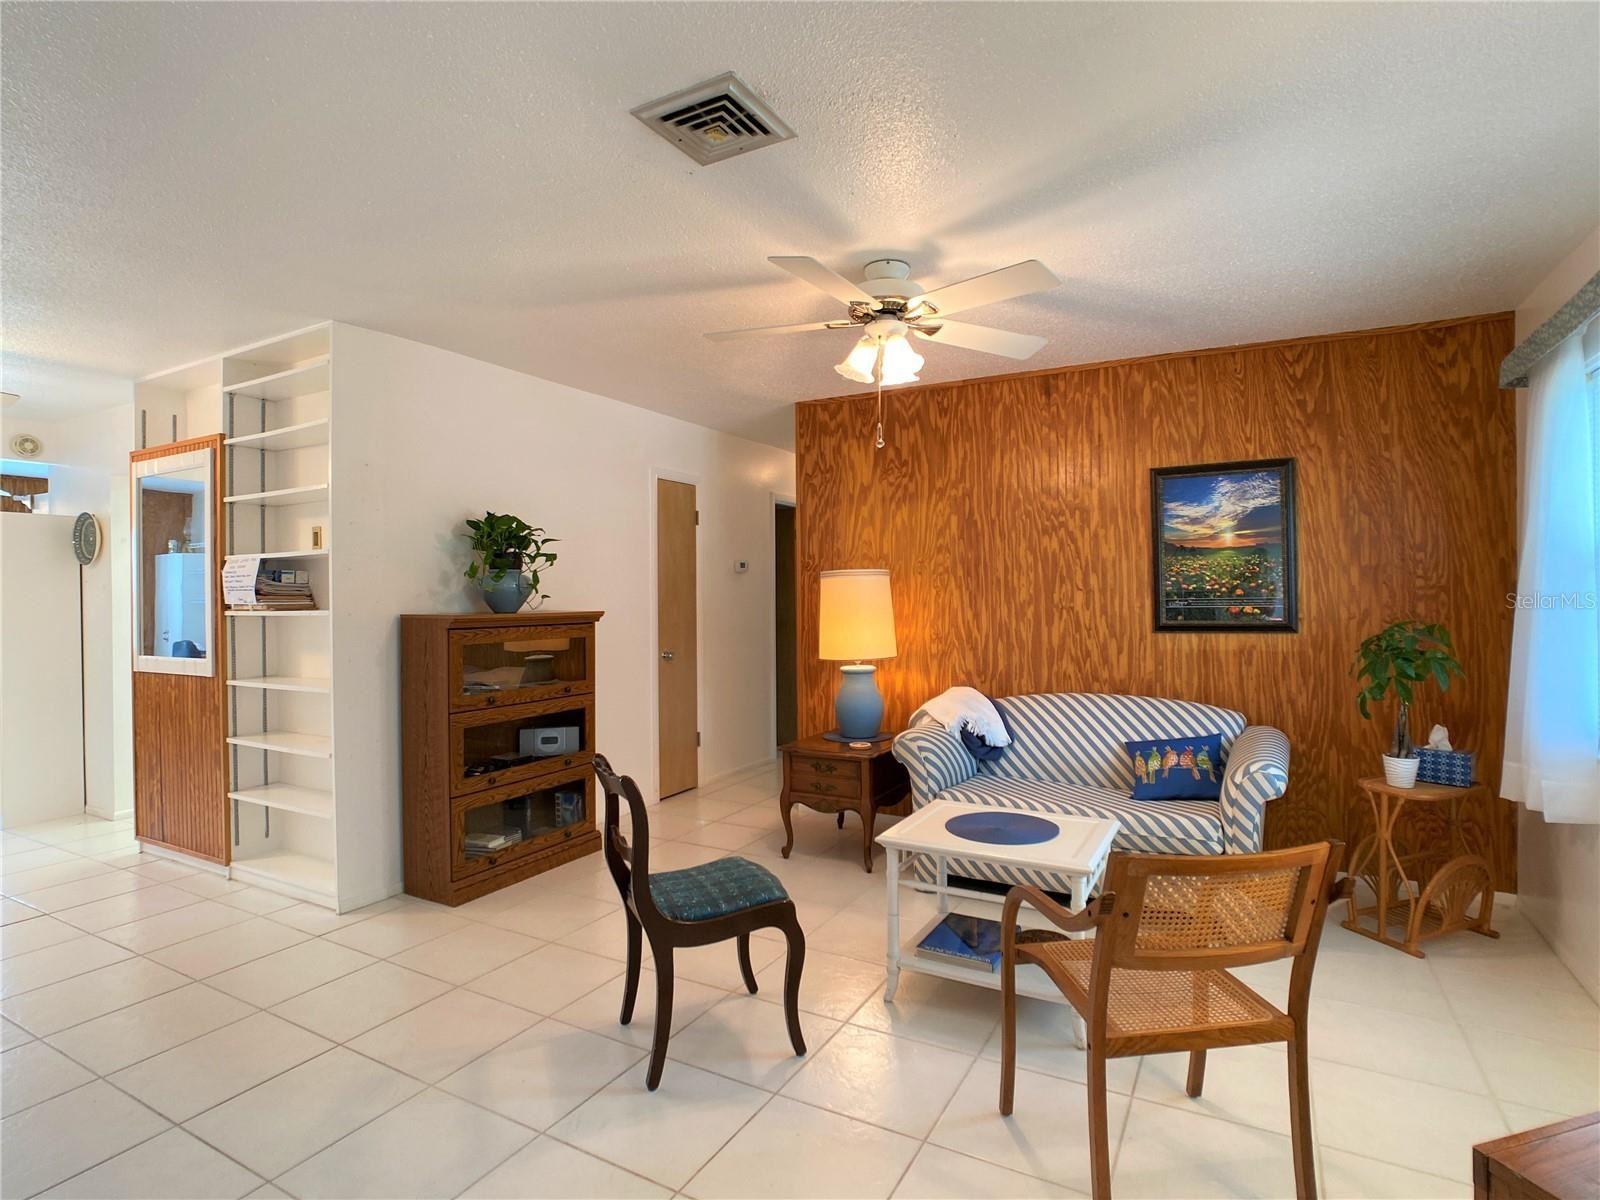 Photo of 212 BEACH MANOR TERRACE #8, VENICE, FL 34285 (MLS # N6116450)